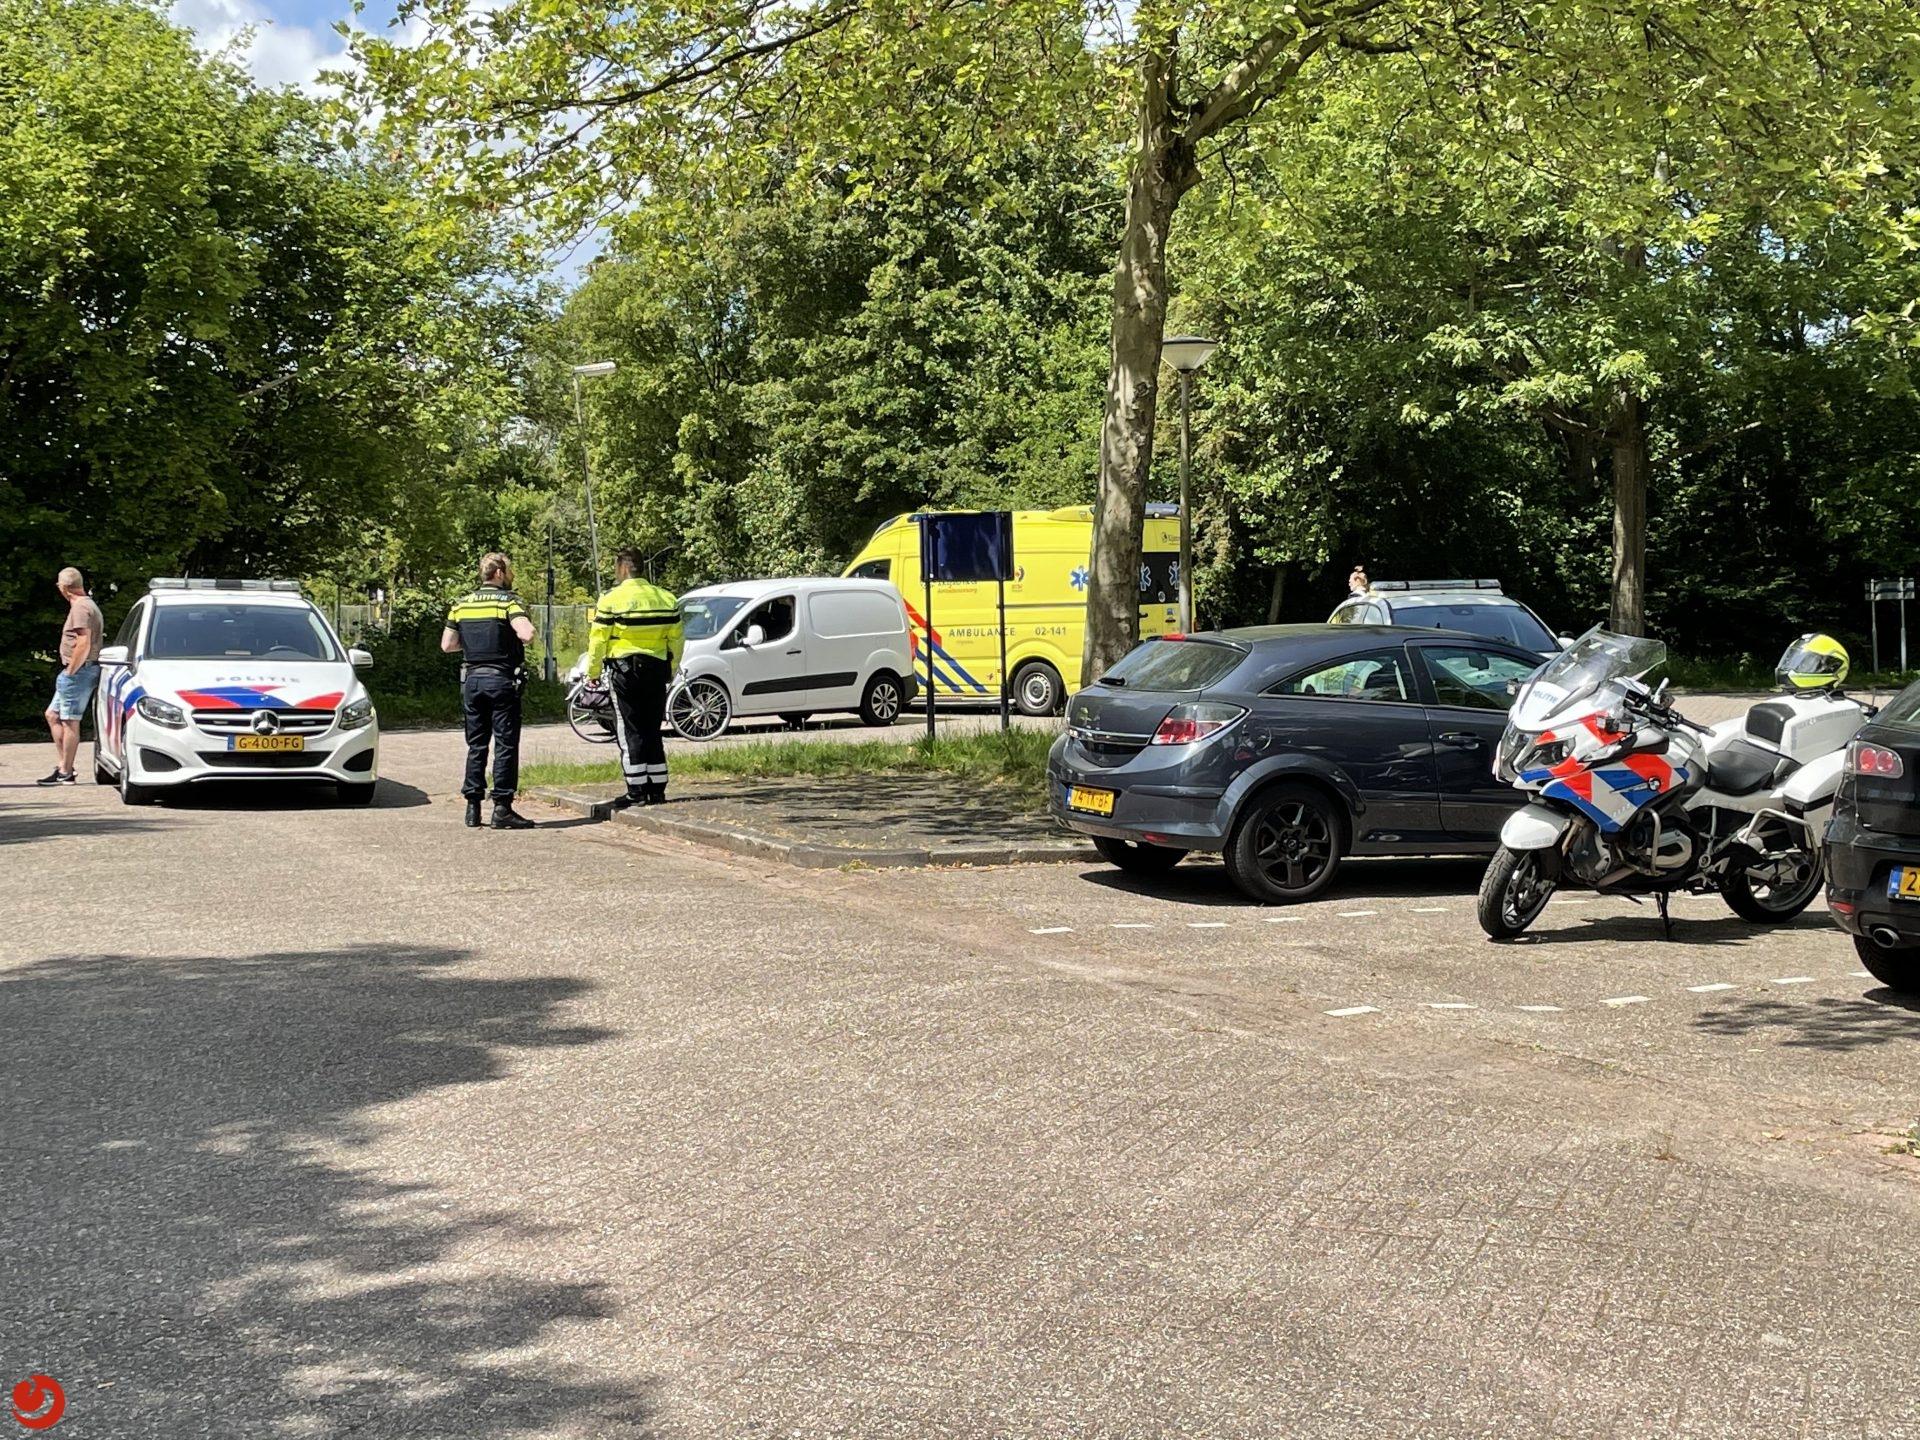 Fietsster gewond bij aanrijding met busje in Leeuwarden.